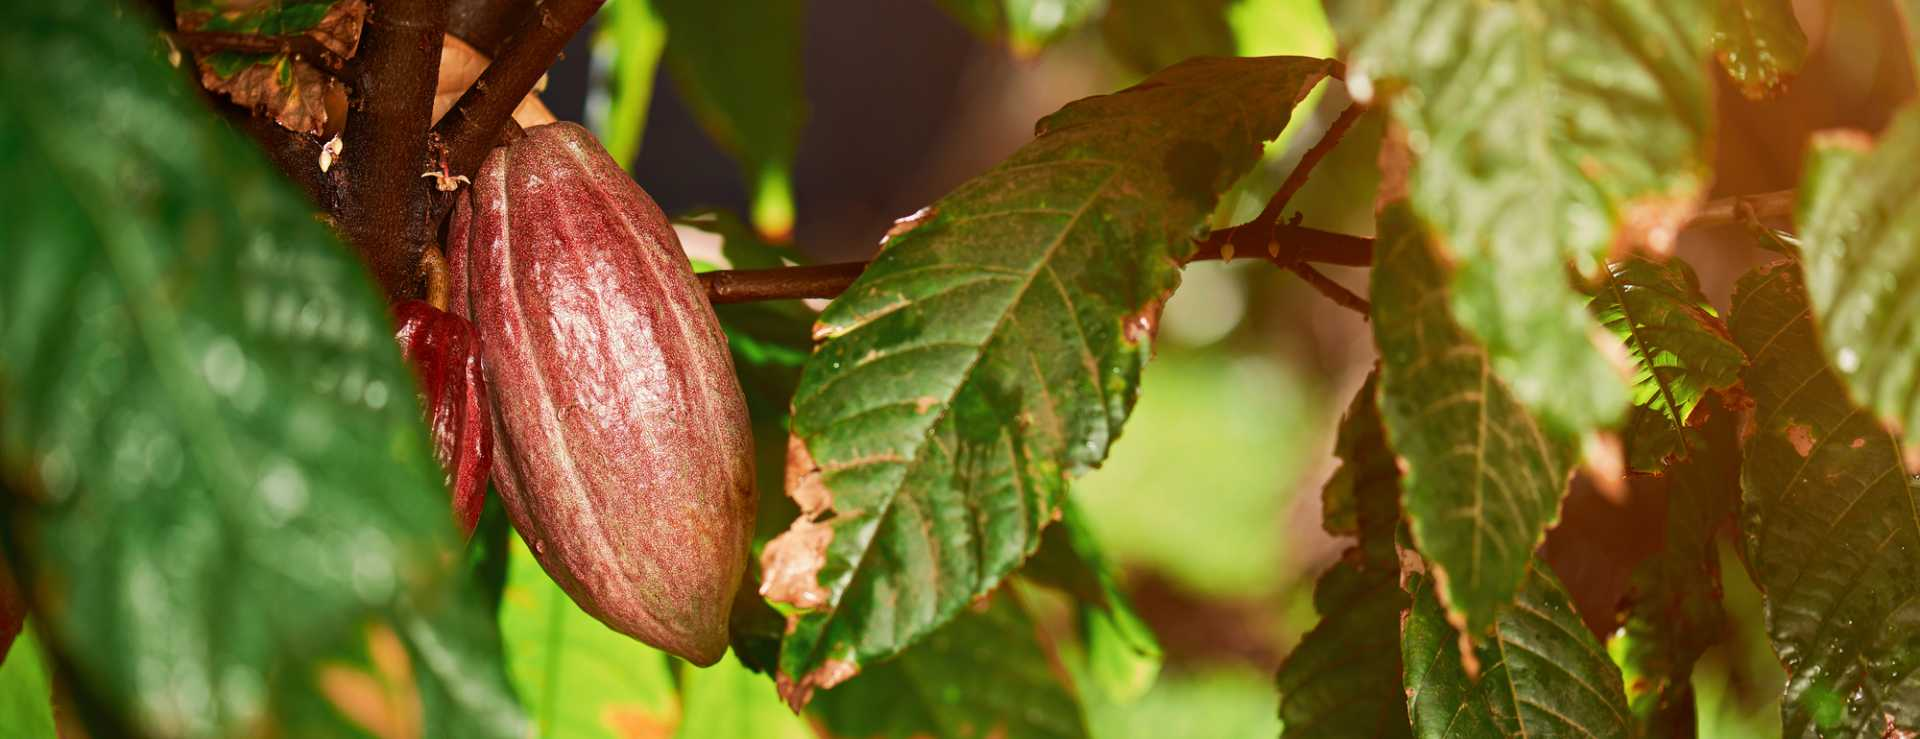 One cocoa pod on tree - image courtesy of Depositphotos.